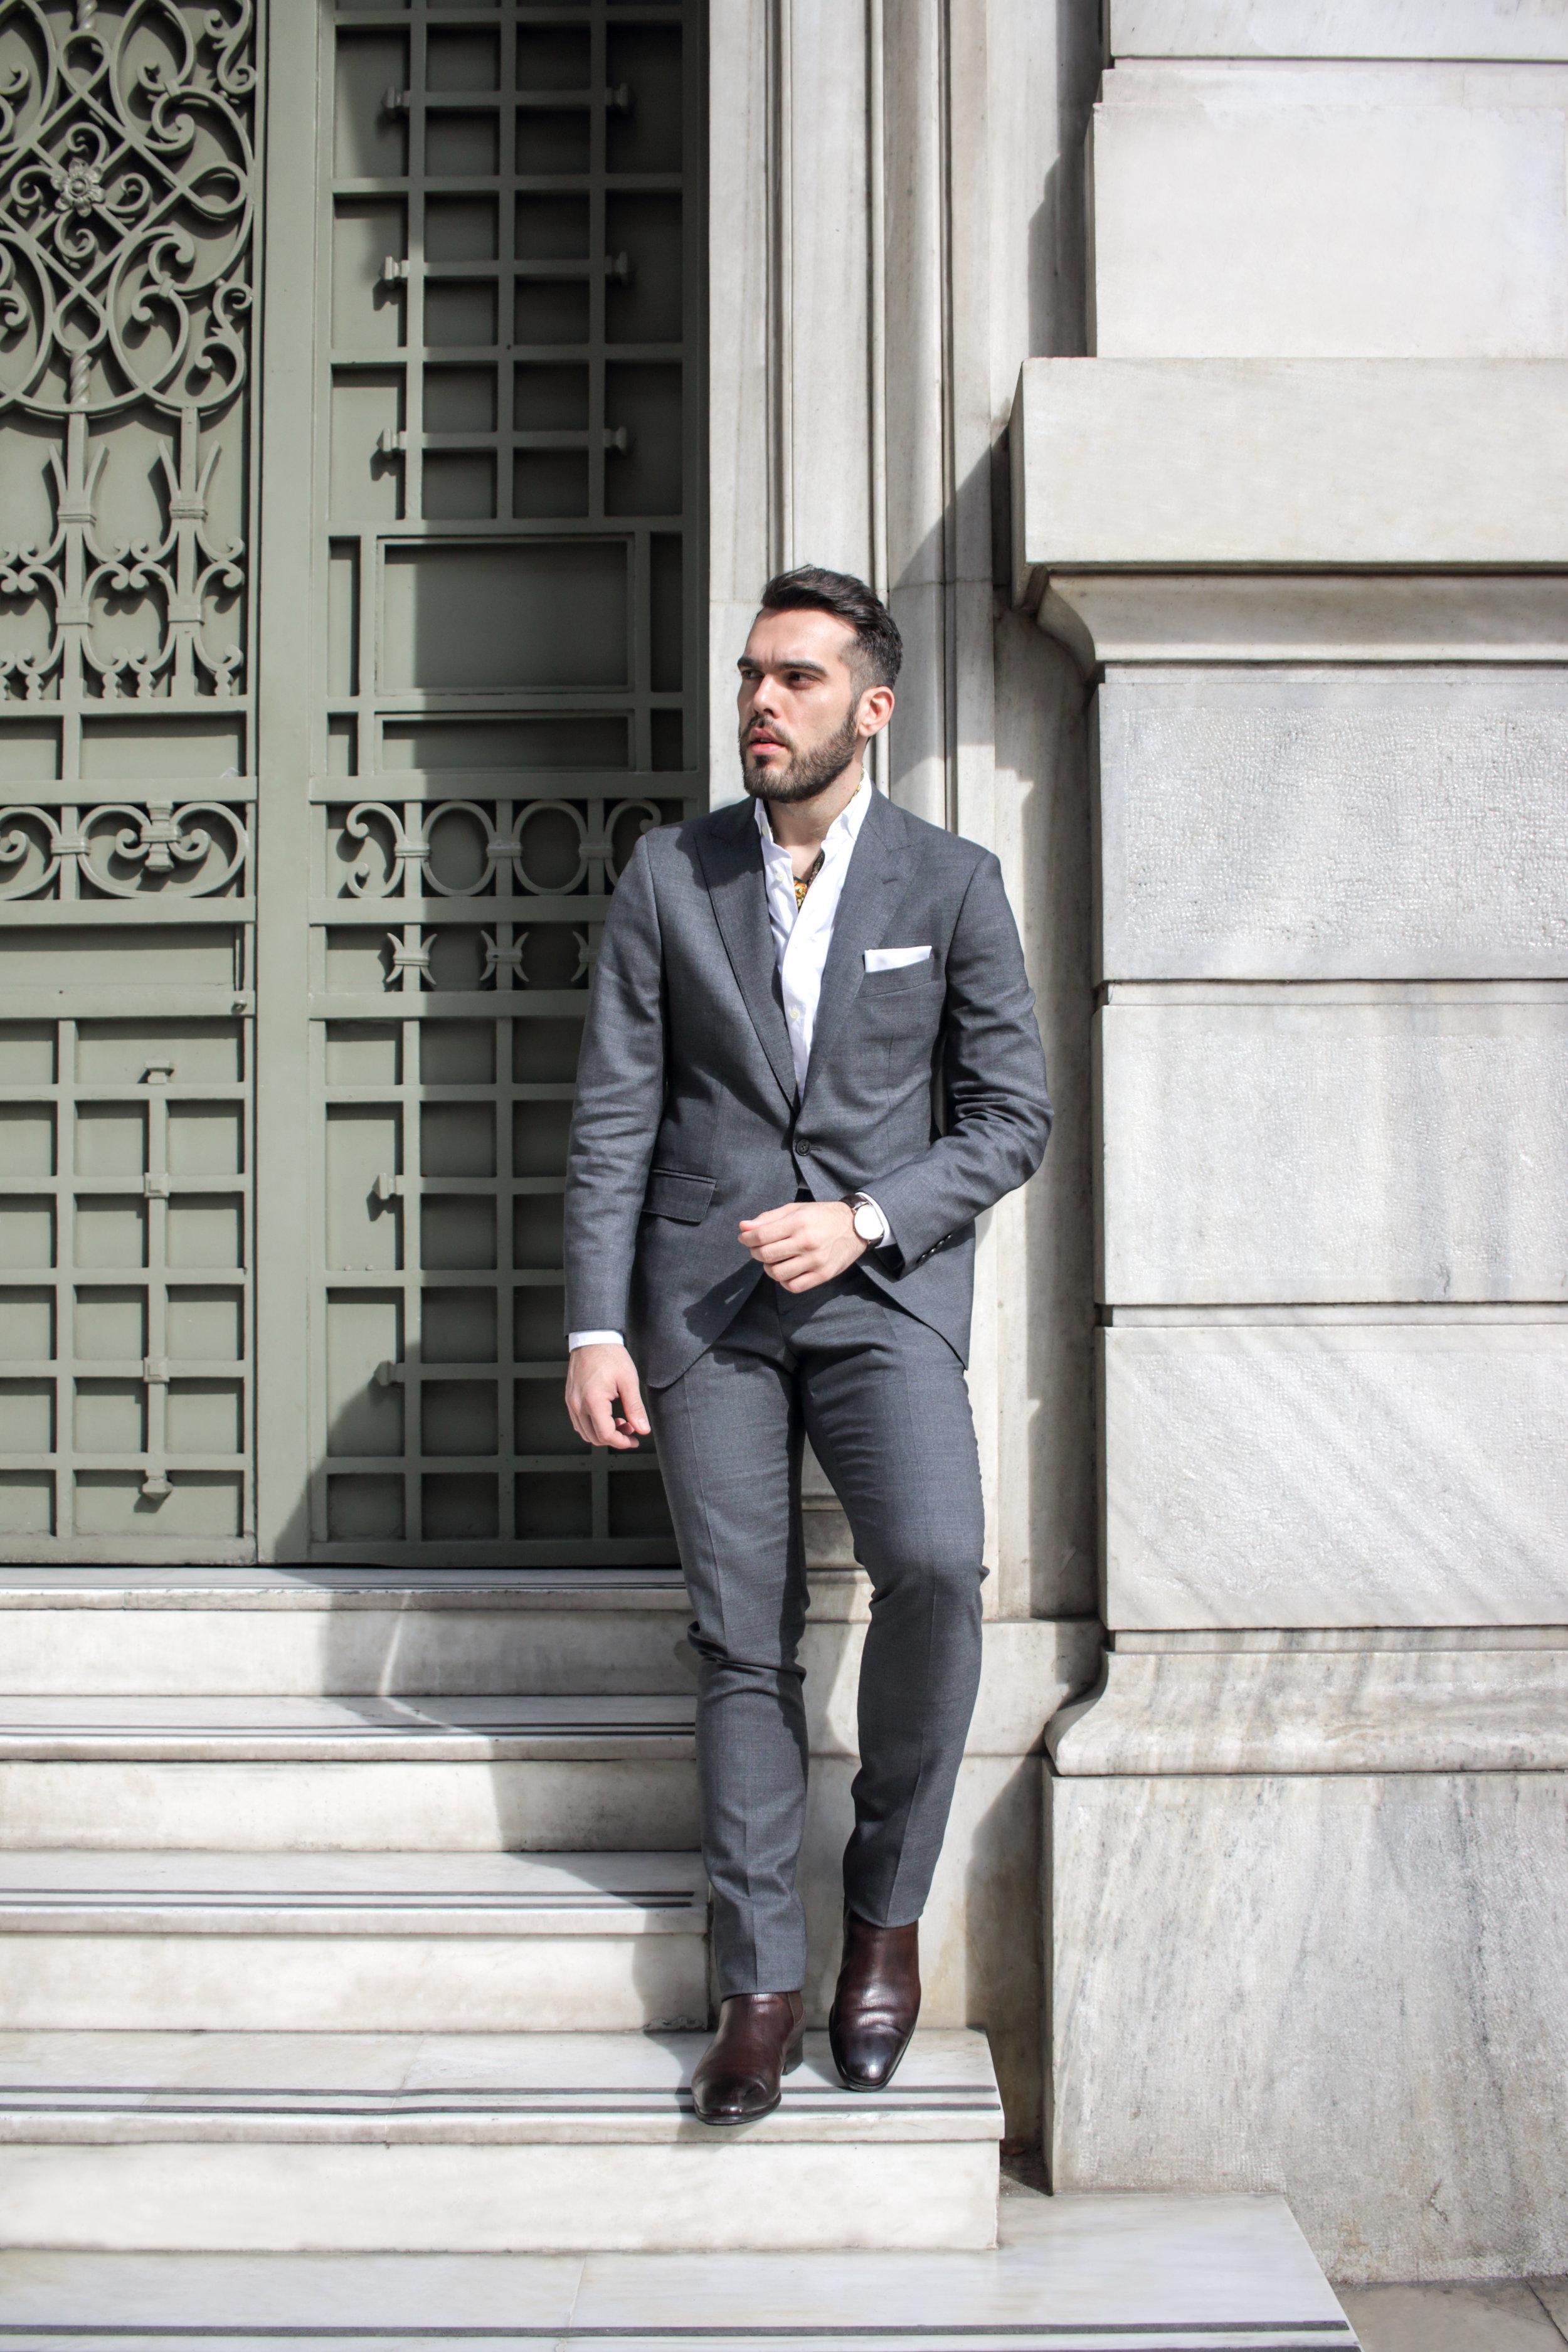 Suit: Hackett London / Shirt: Hackett London / Scarf: Personal Collection / Shoes: Personal Collection